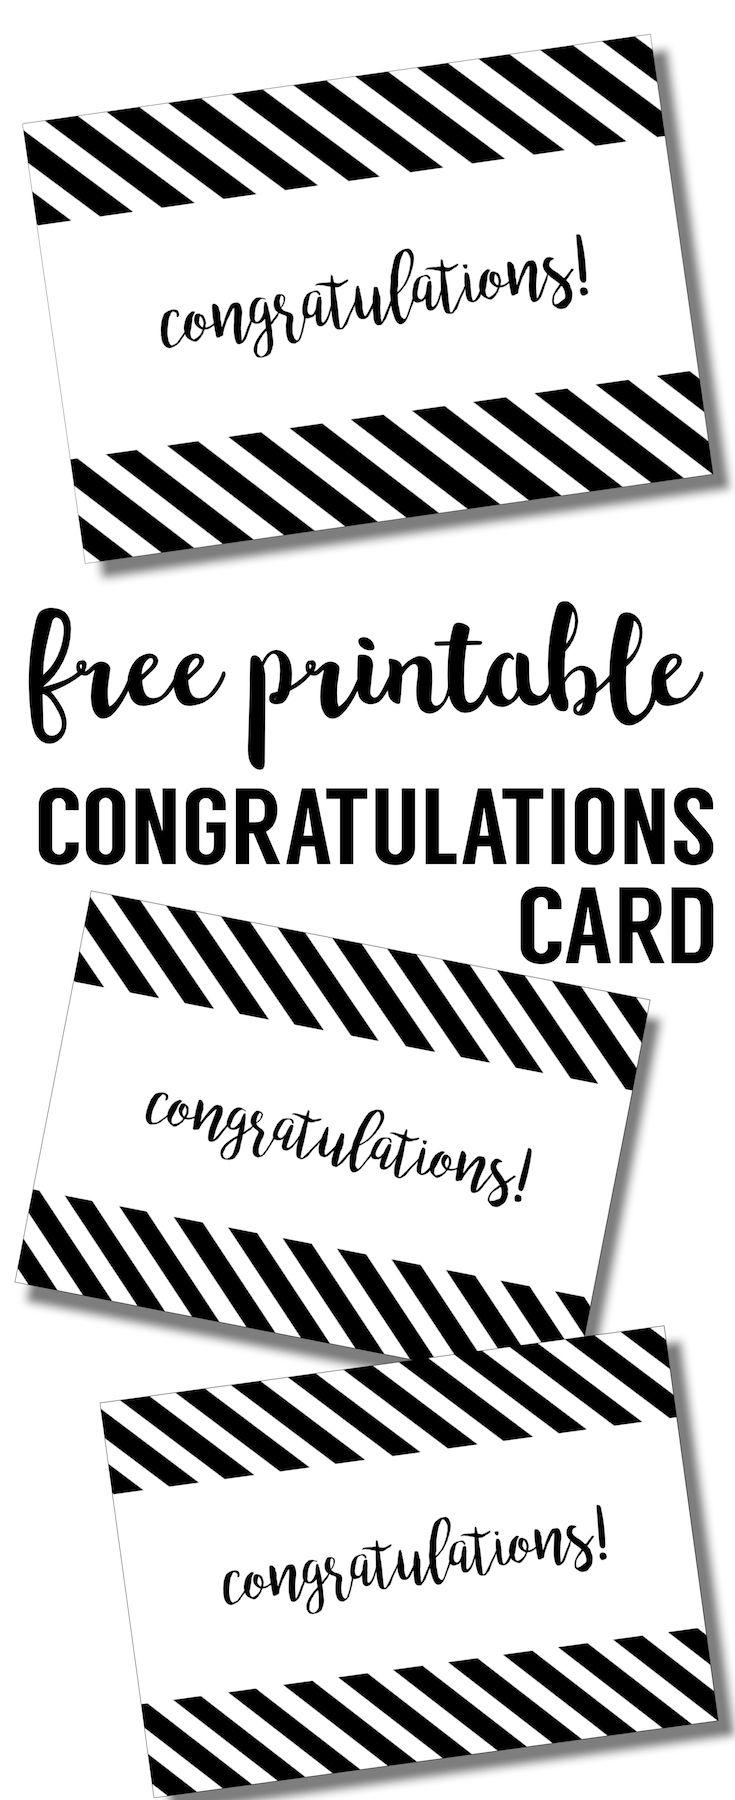 Free Printable Congratulations Card Congratulations Card